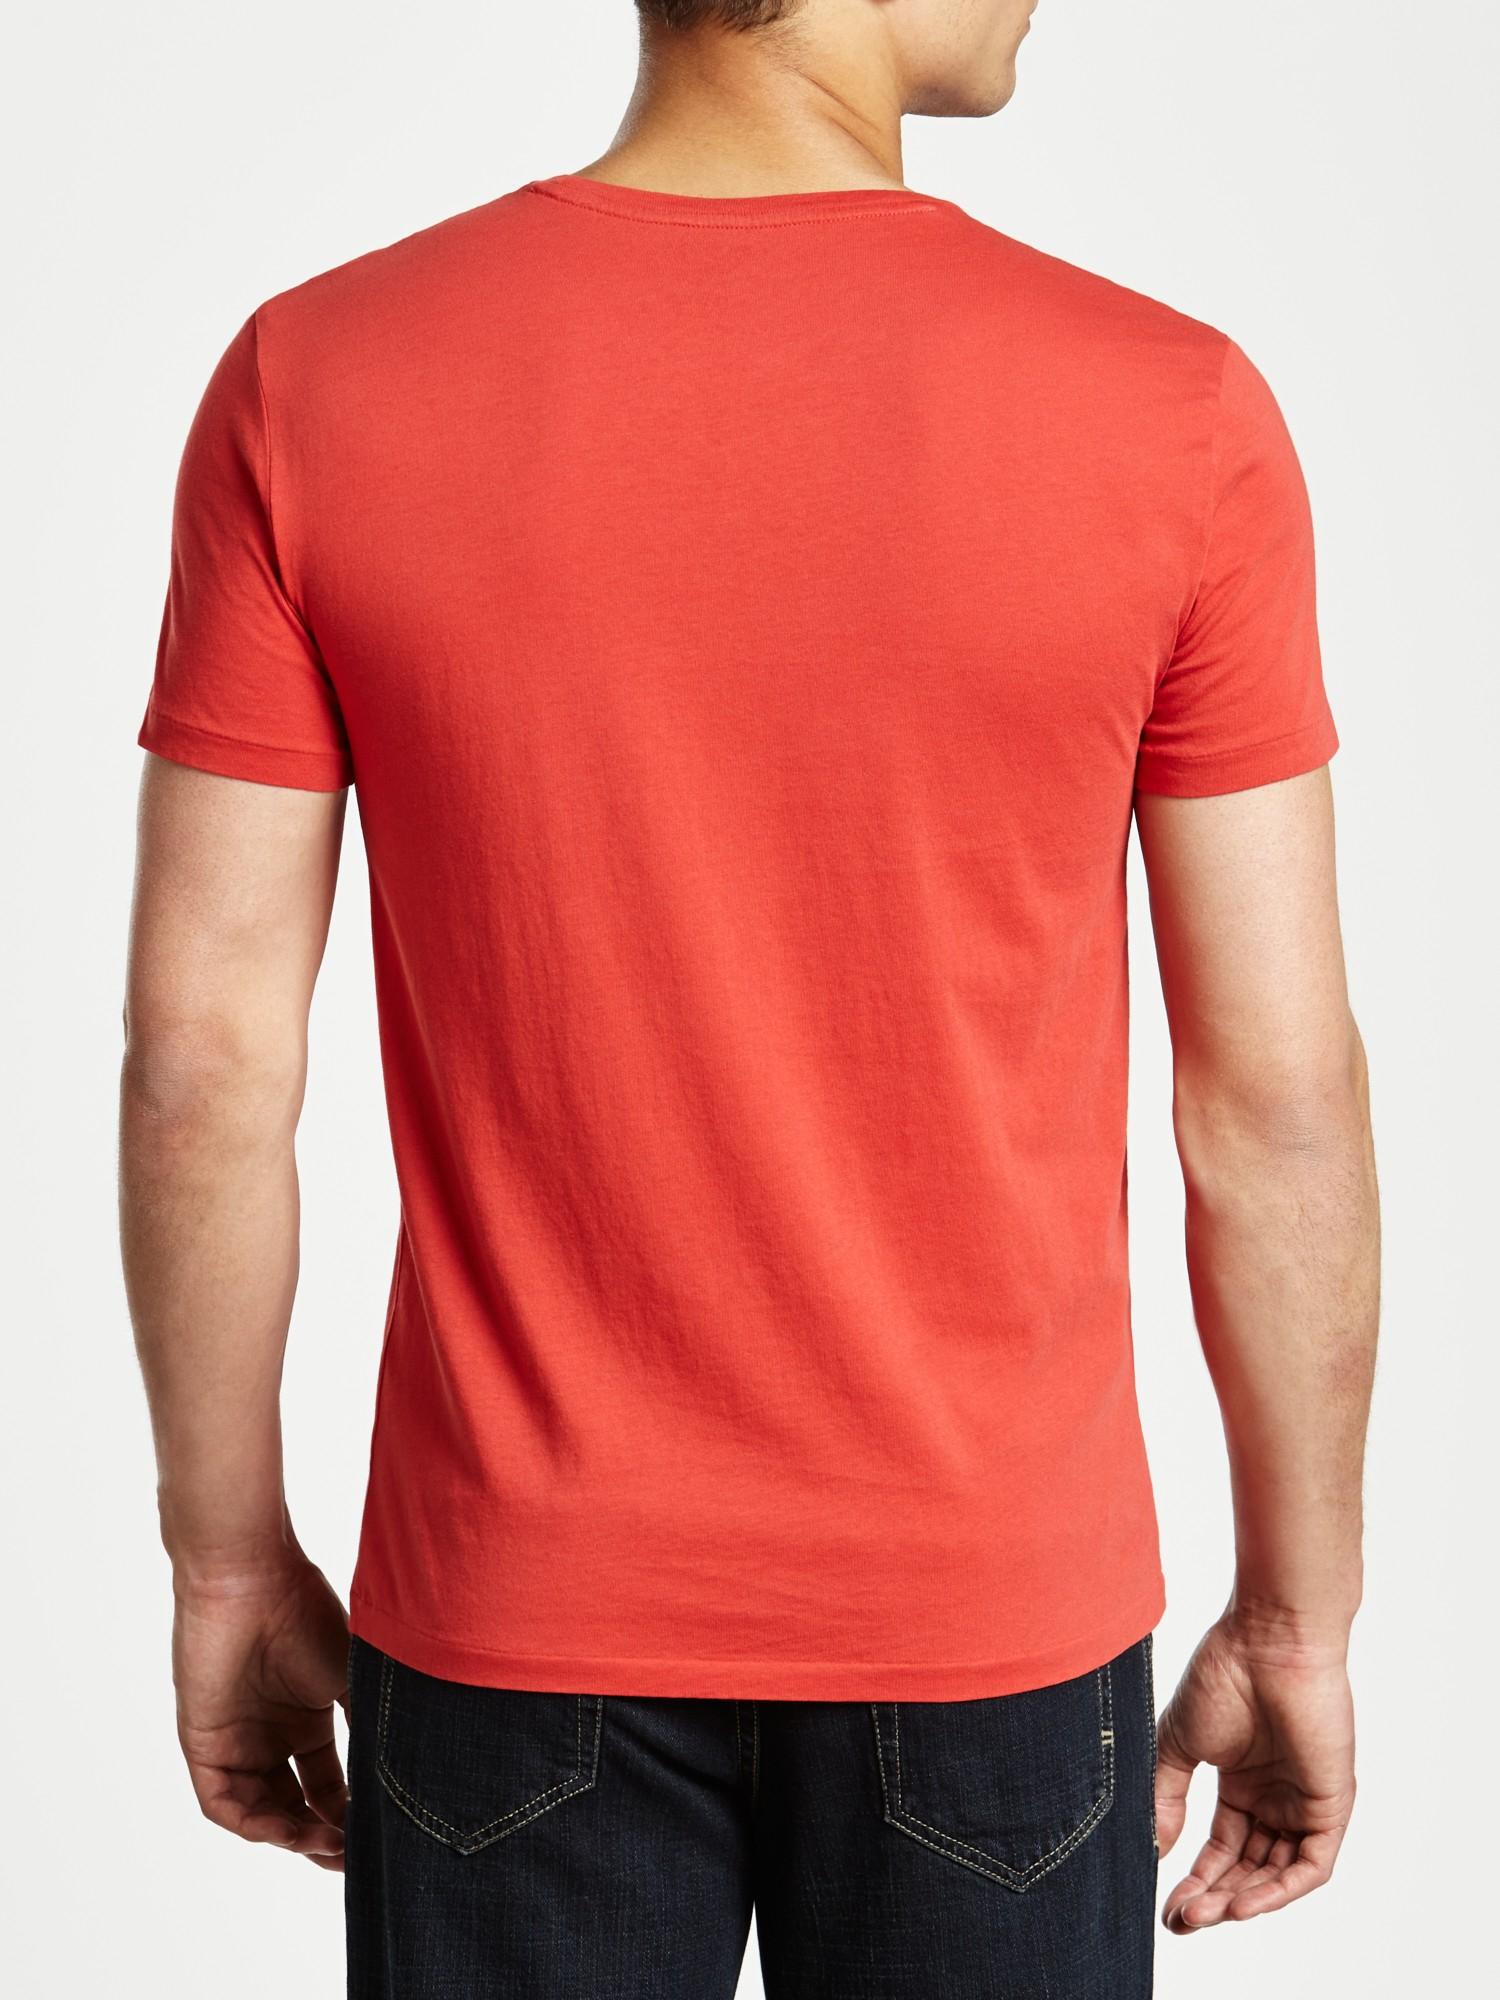 polo ralph lauren anchor logo t shirt in pink for men lyst. Black Bedroom Furniture Sets. Home Design Ideas